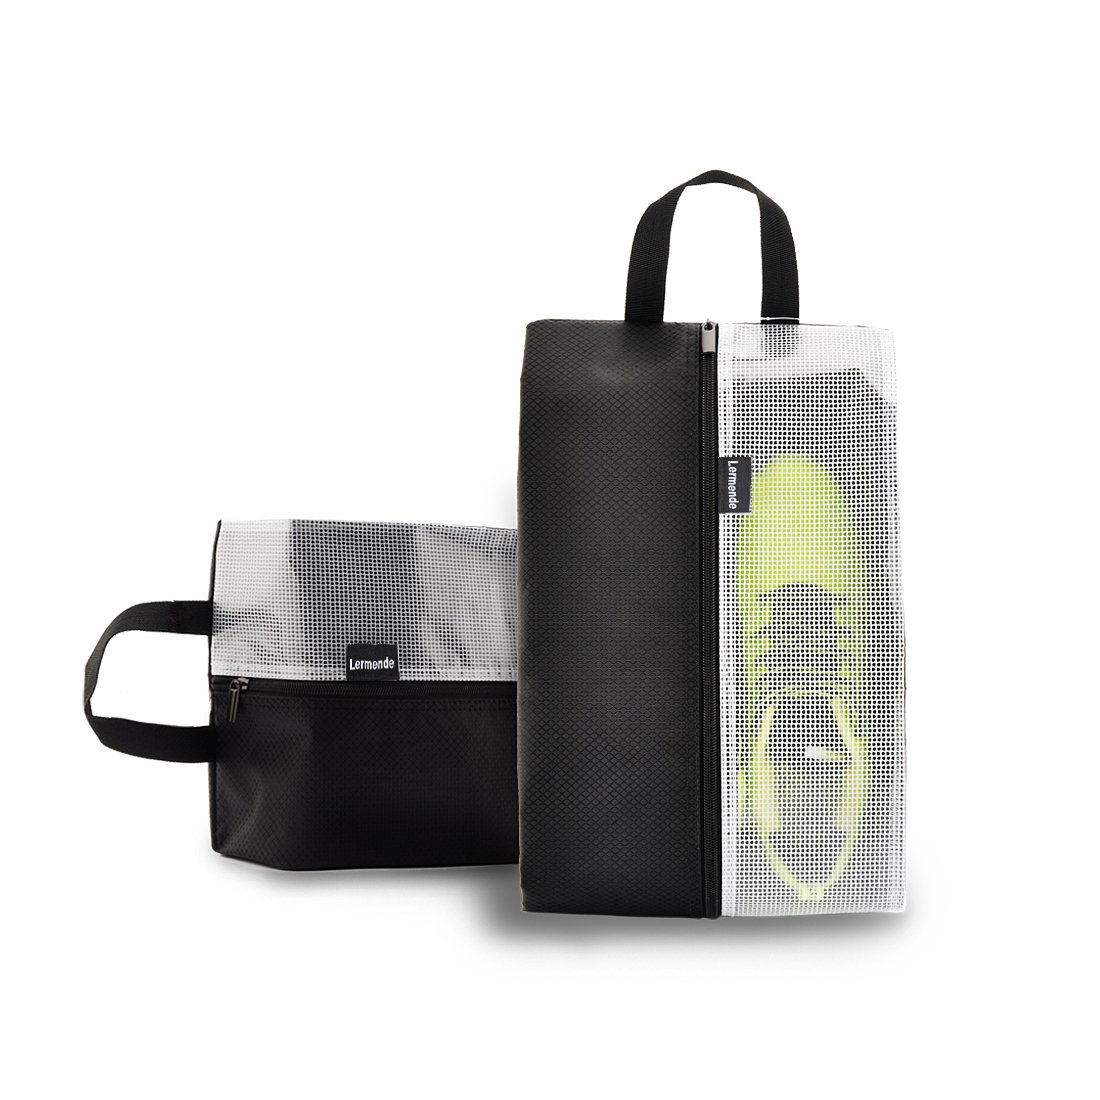 Lermende Travel Shoe Bags Waterproof Nylon Organizer Storage Tote Pouch 5pcs by Lermende (Image #5)